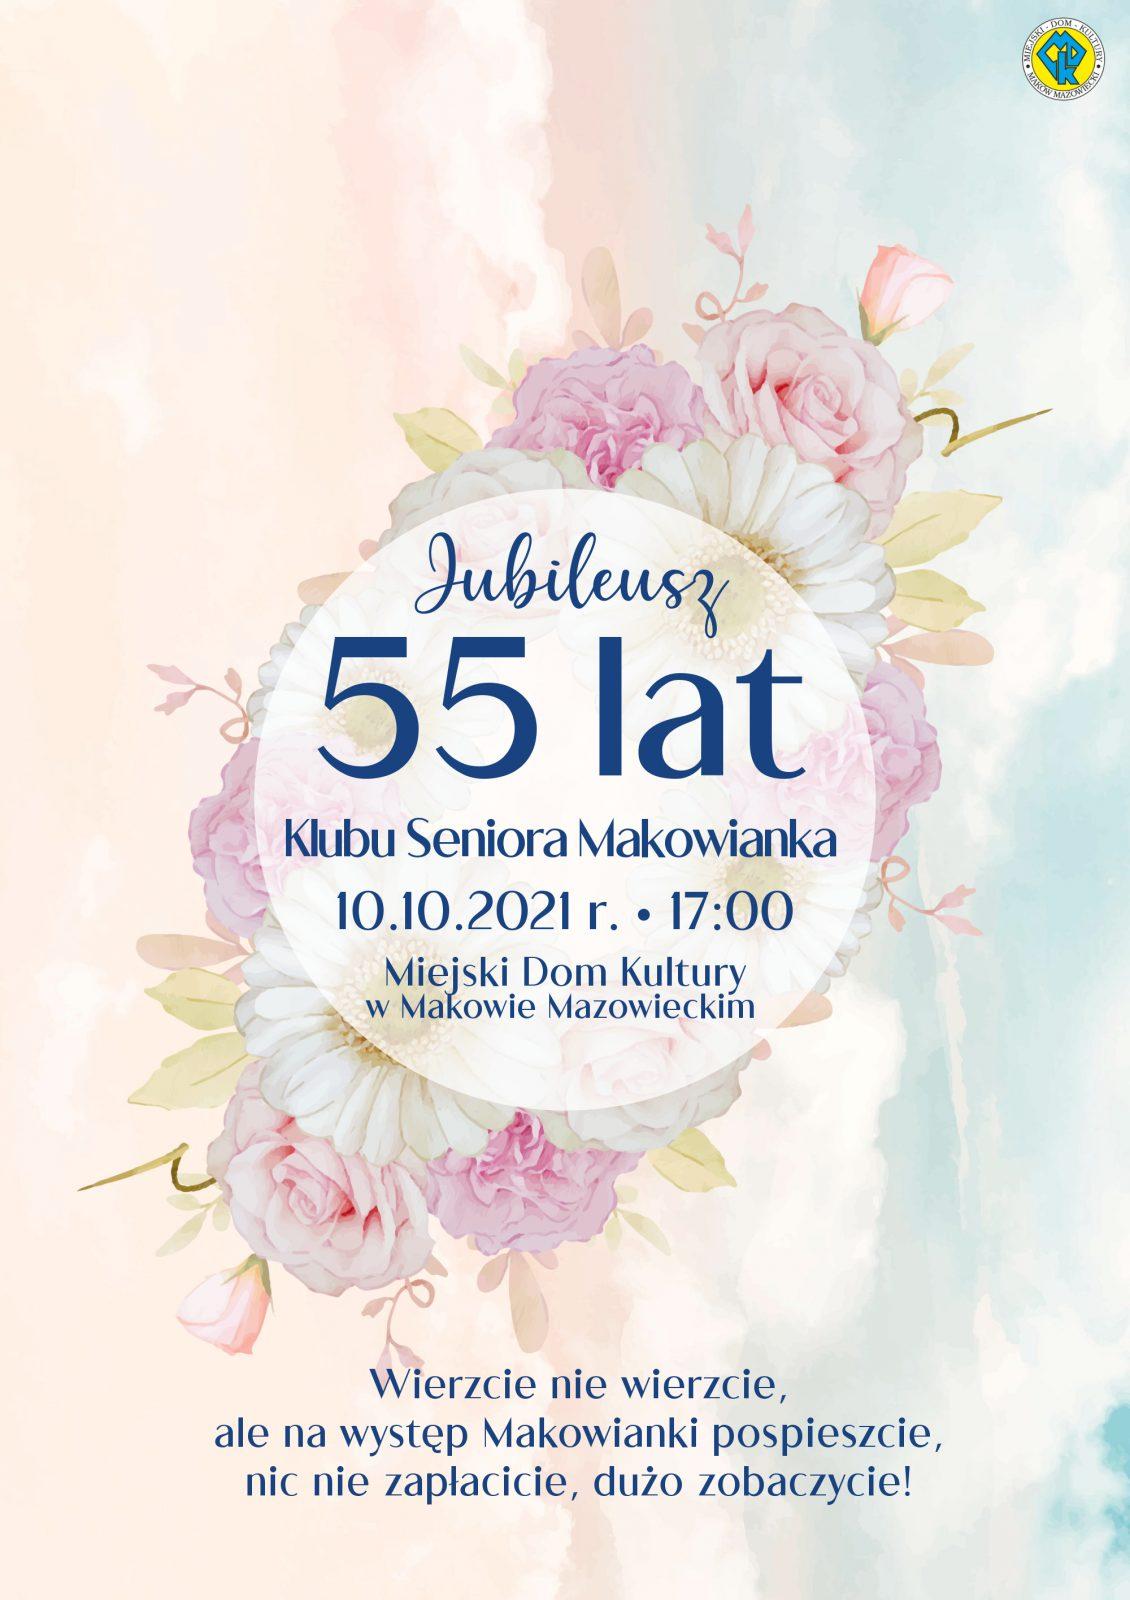 Plakat. Jubileusz 55 lecia Klubu seniora Makowianka. 10 października 2021 godzina 17:00